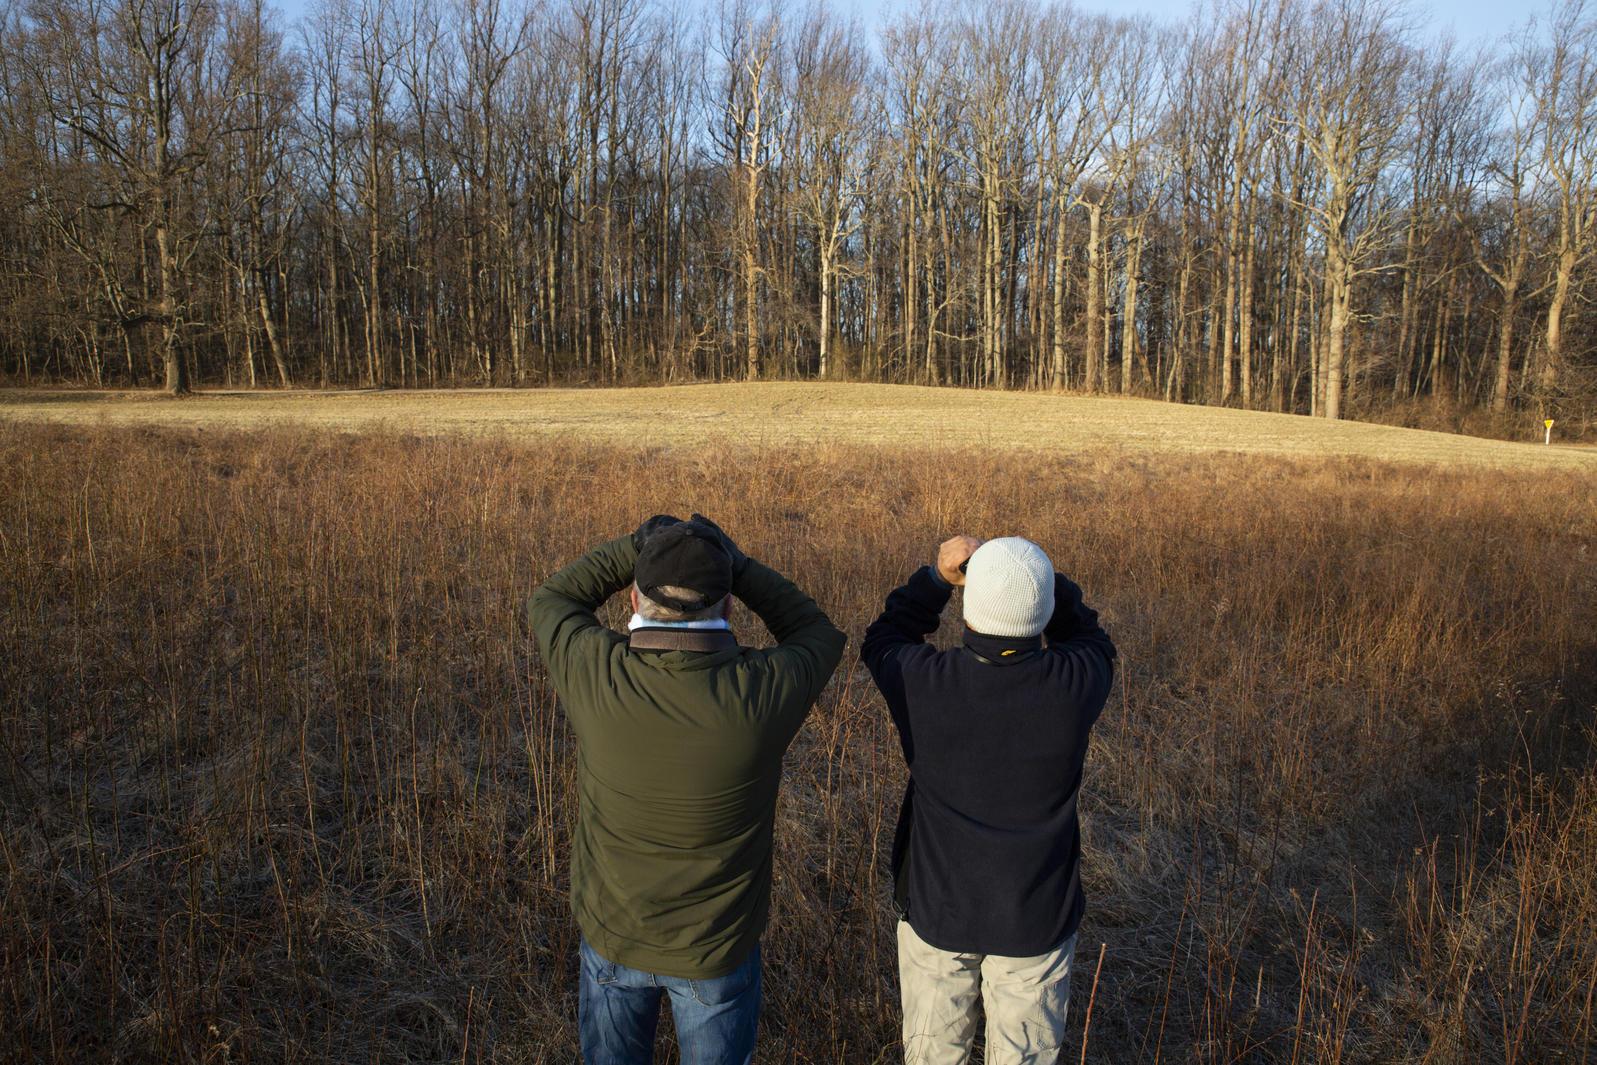 Michigan, Climate Watch, Community Science, Volunteer